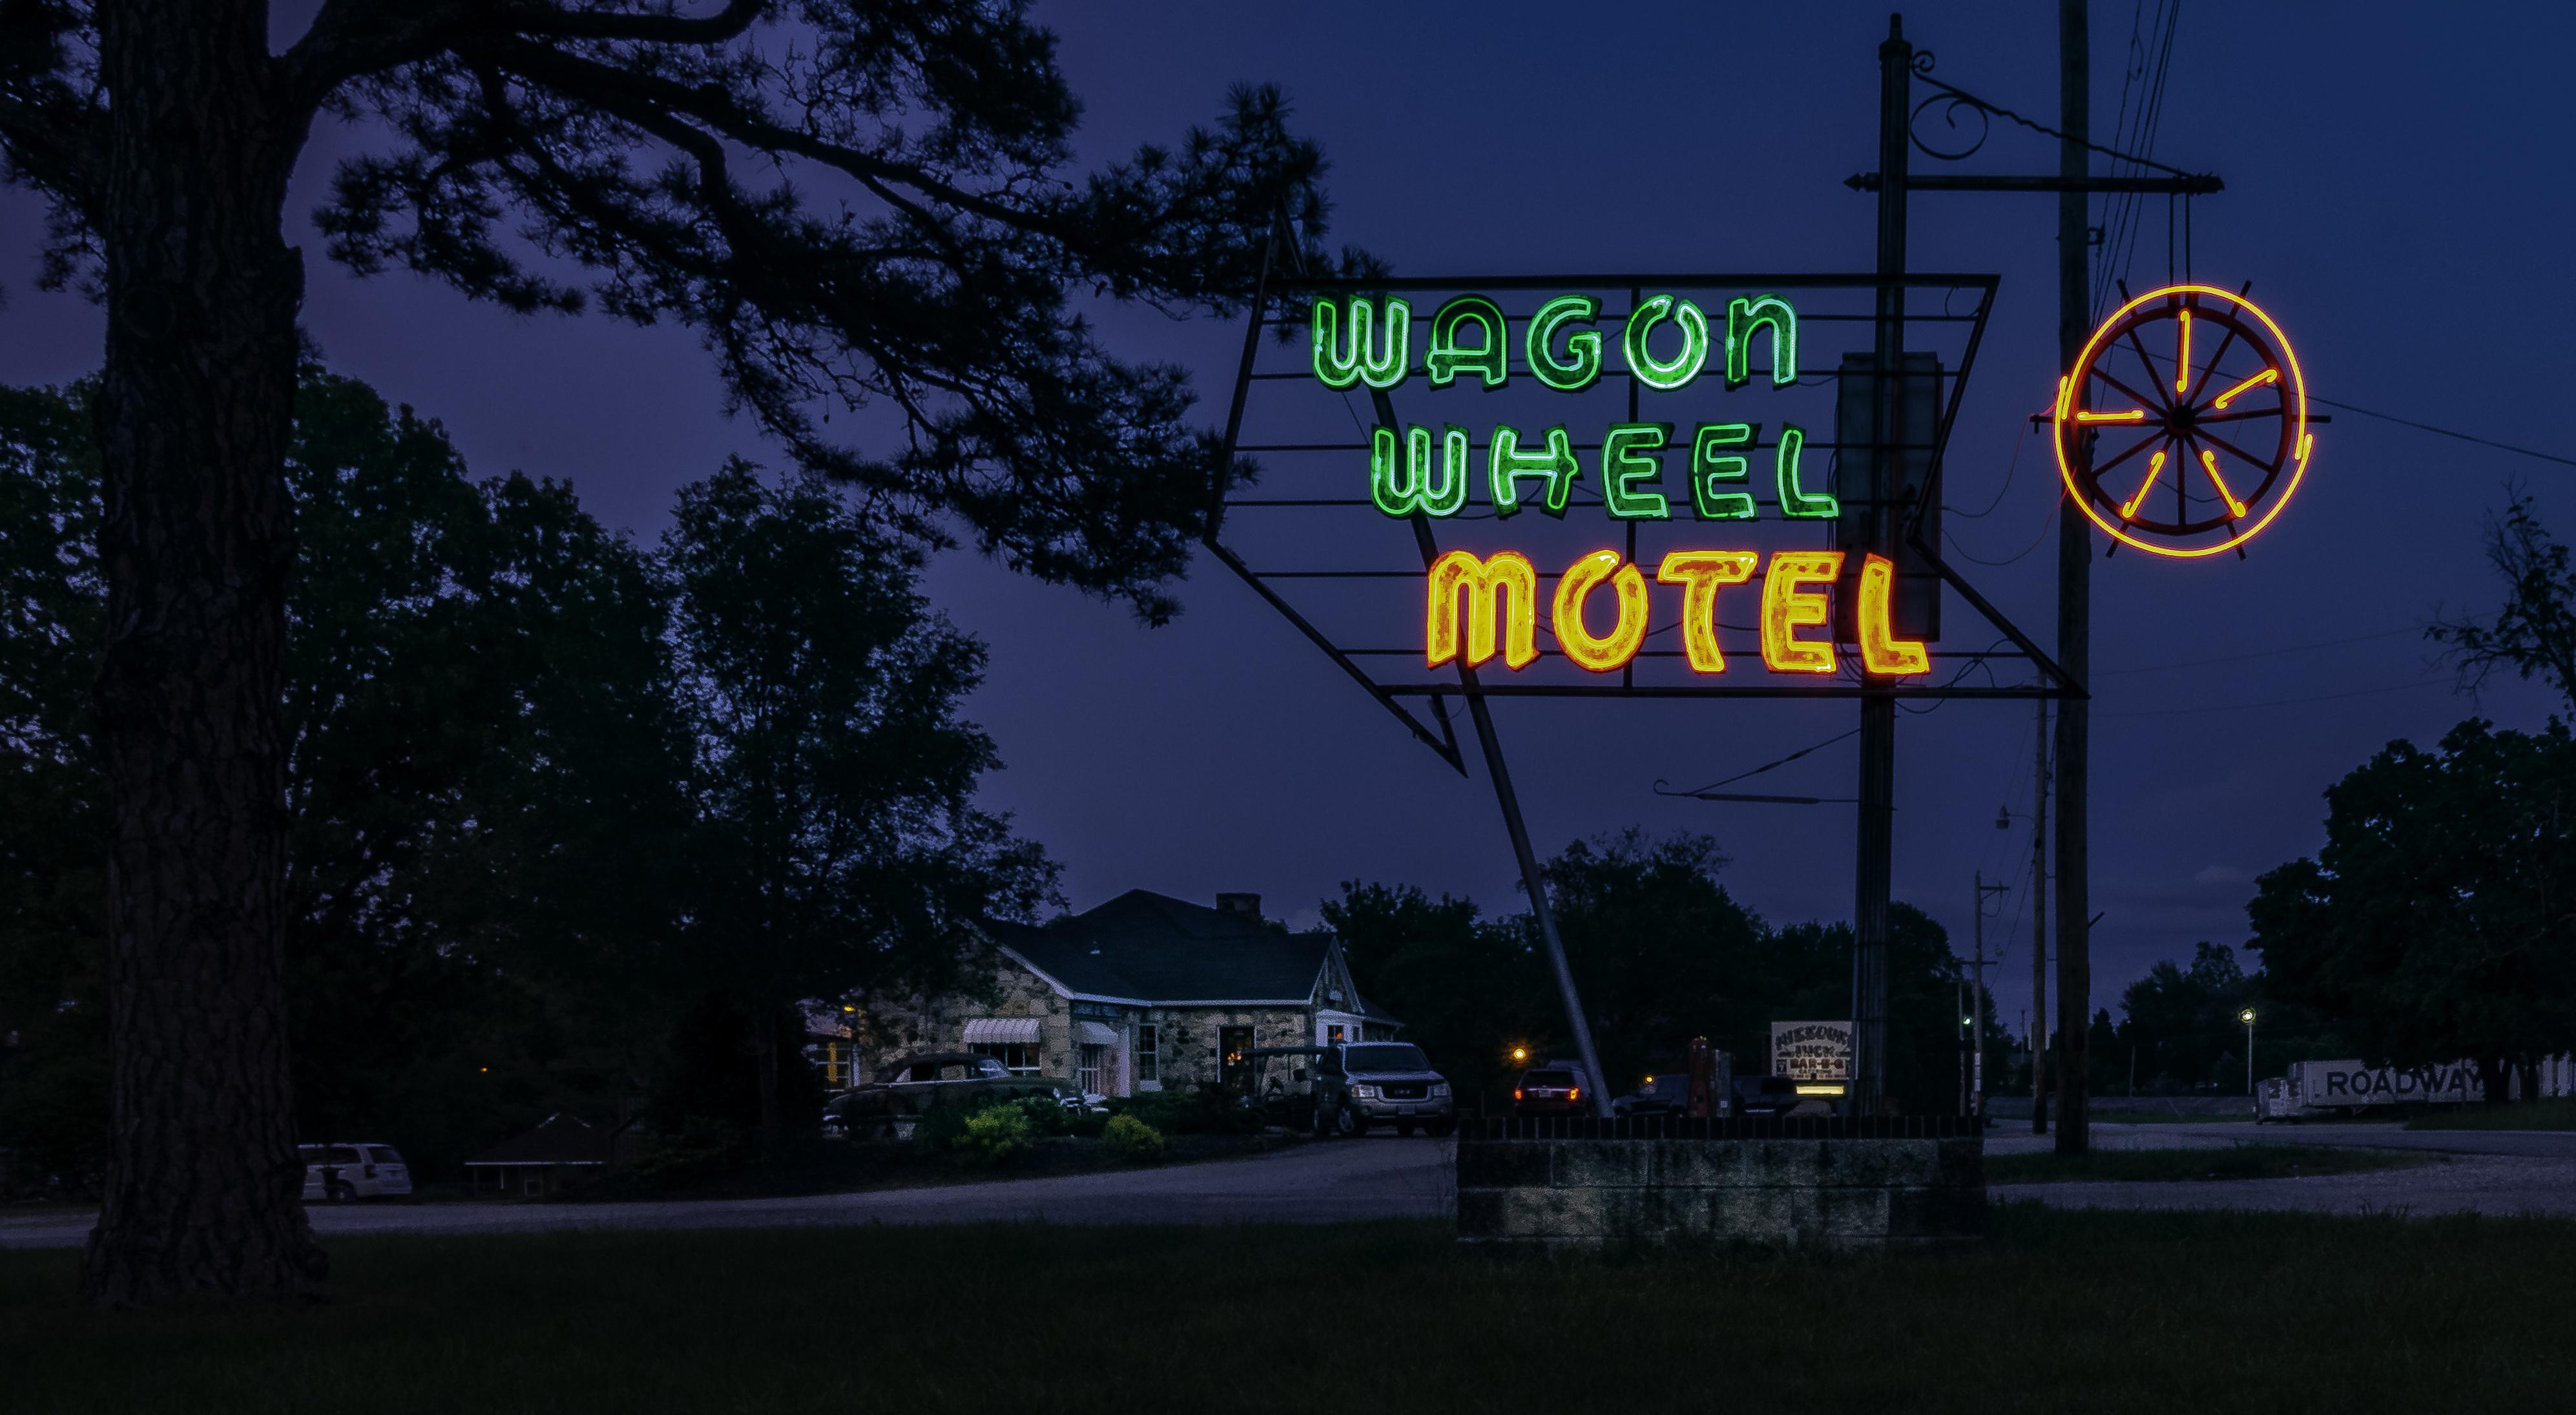 Wagon Wheel Motel - 901 East Washington Boulevard, Cuba, Missouri U.S.A. - May 21, 2018